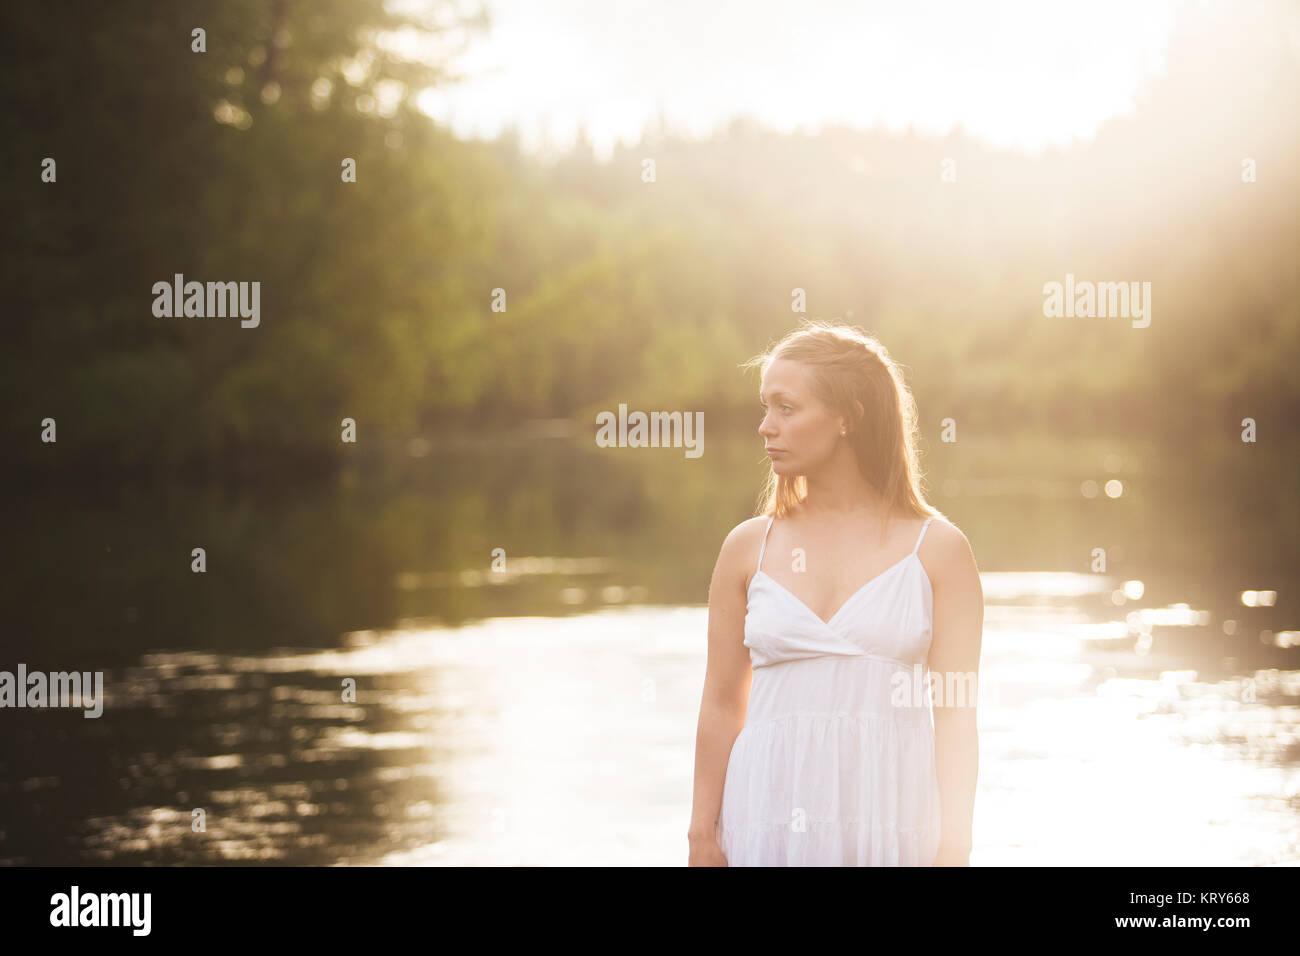 Woman wearing white dress by river Photo Stock